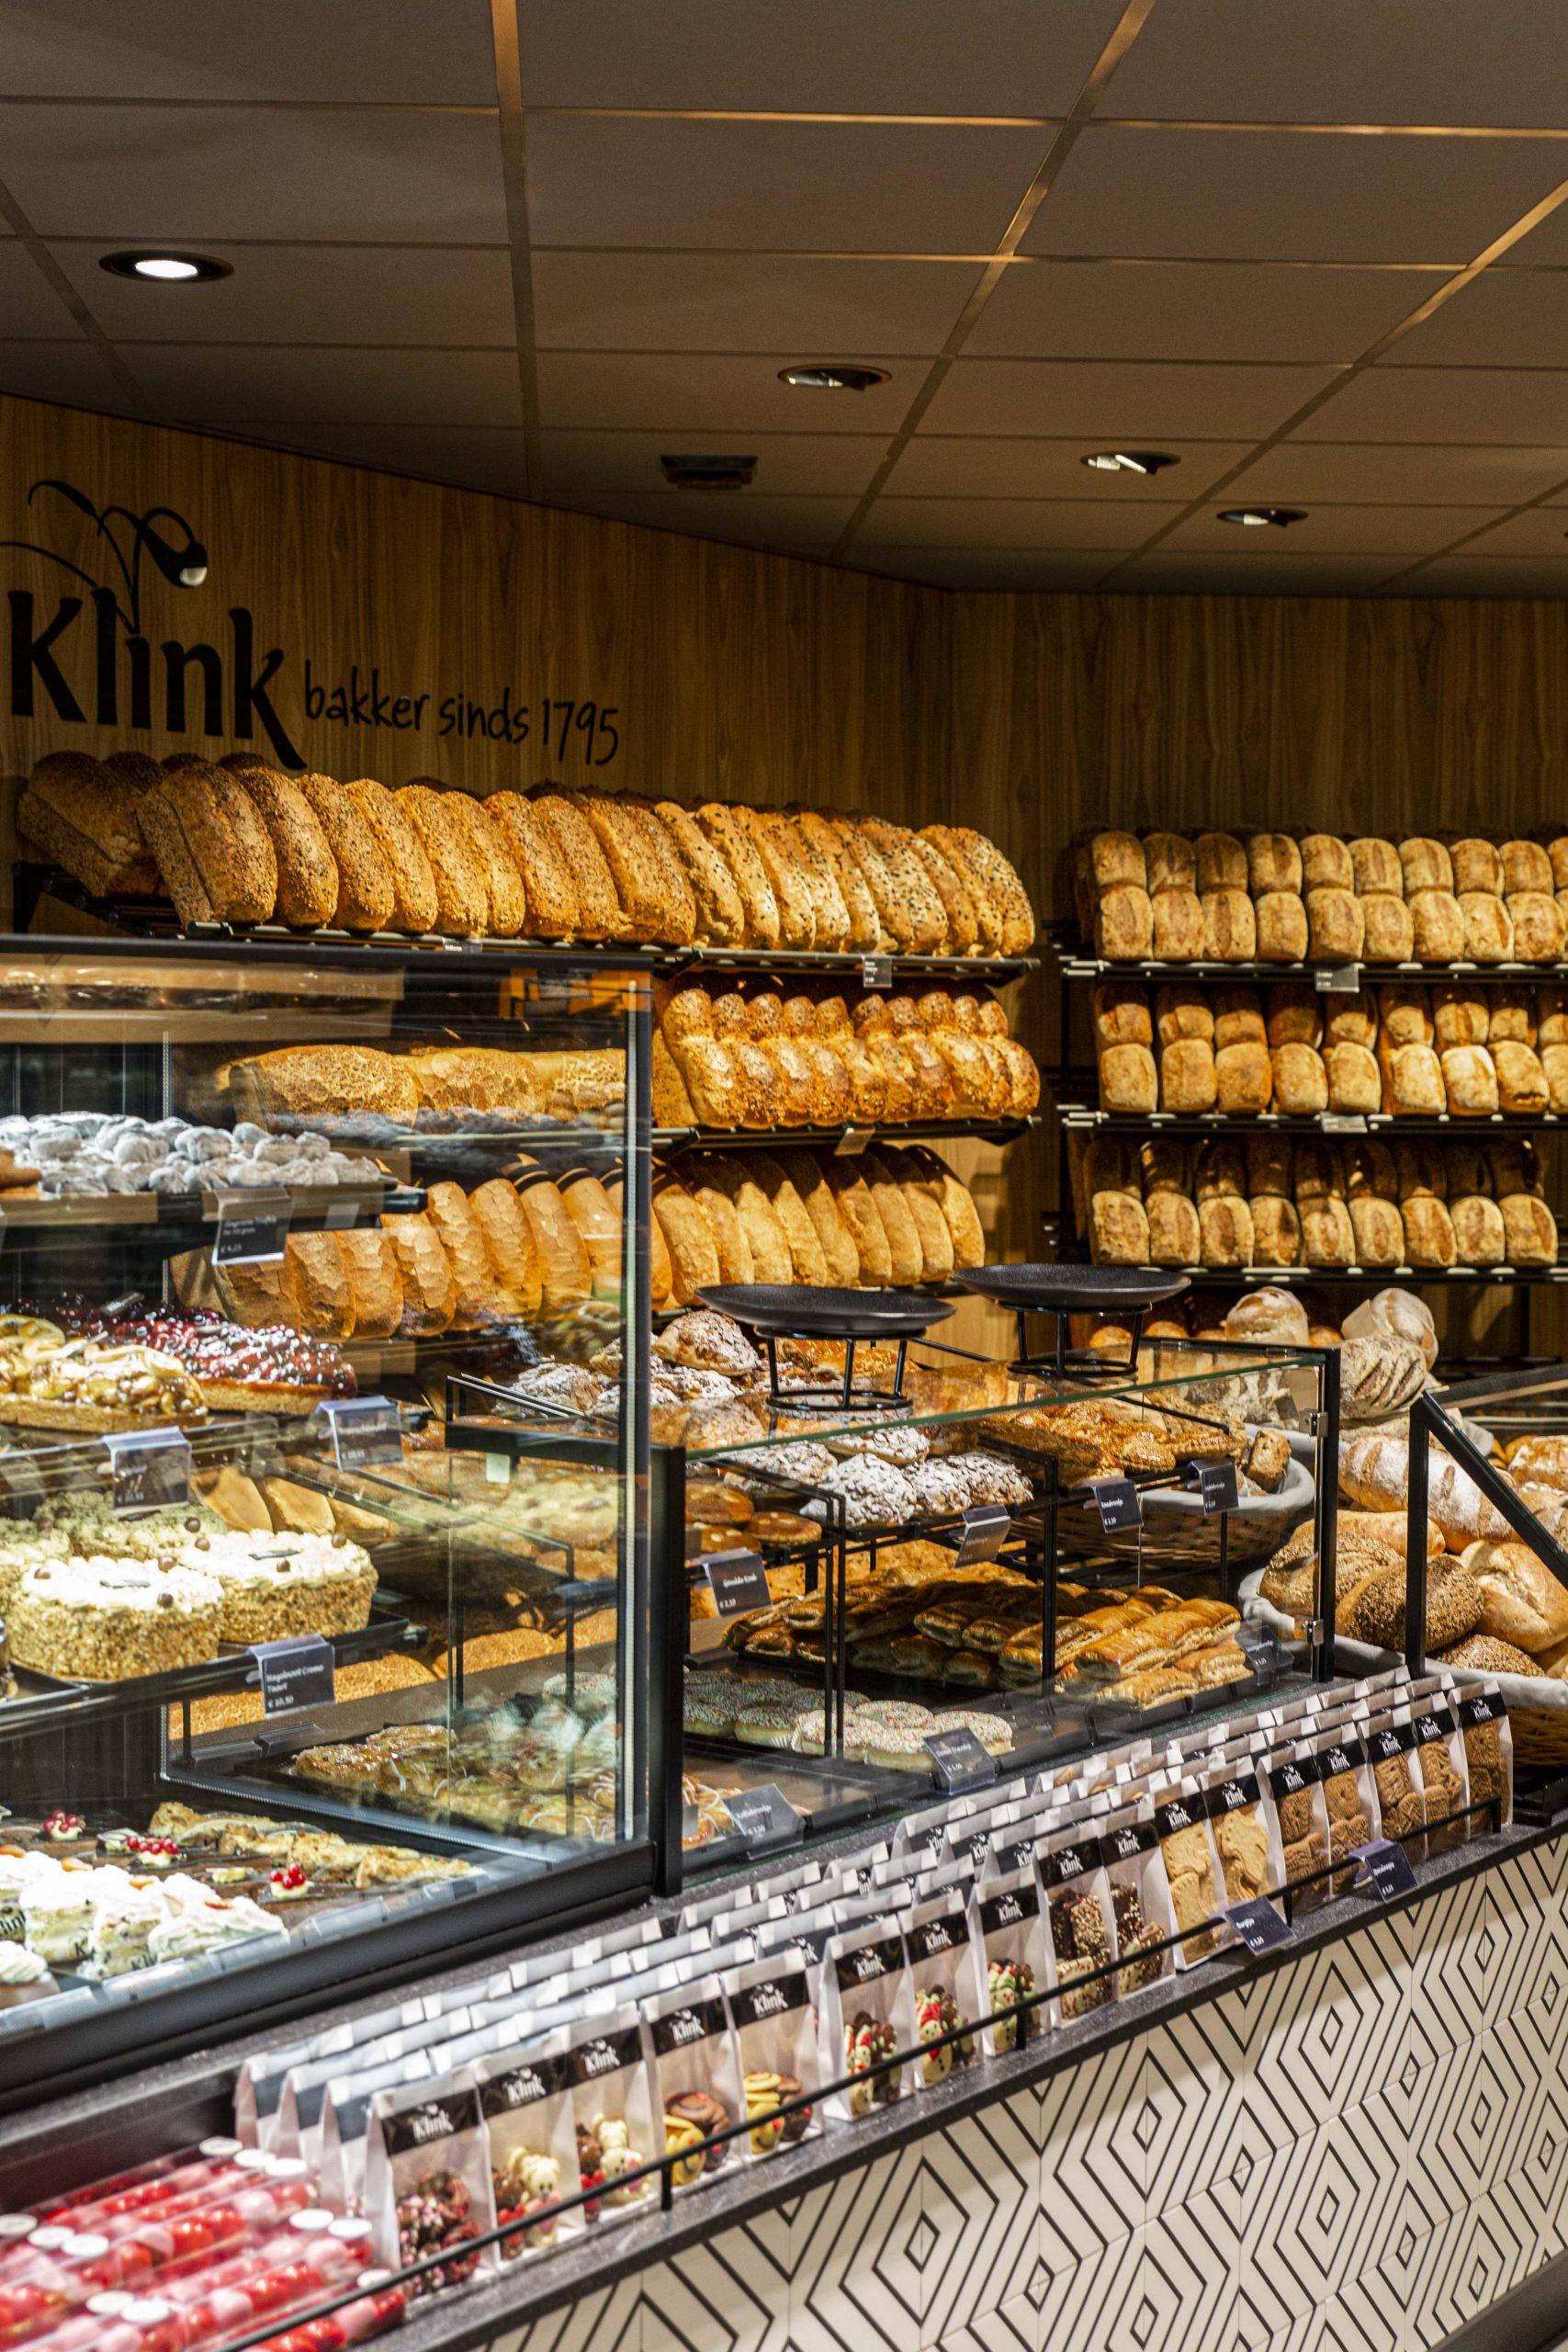 Bakker Klink winkel Koningin Julianalaan opening broodrek